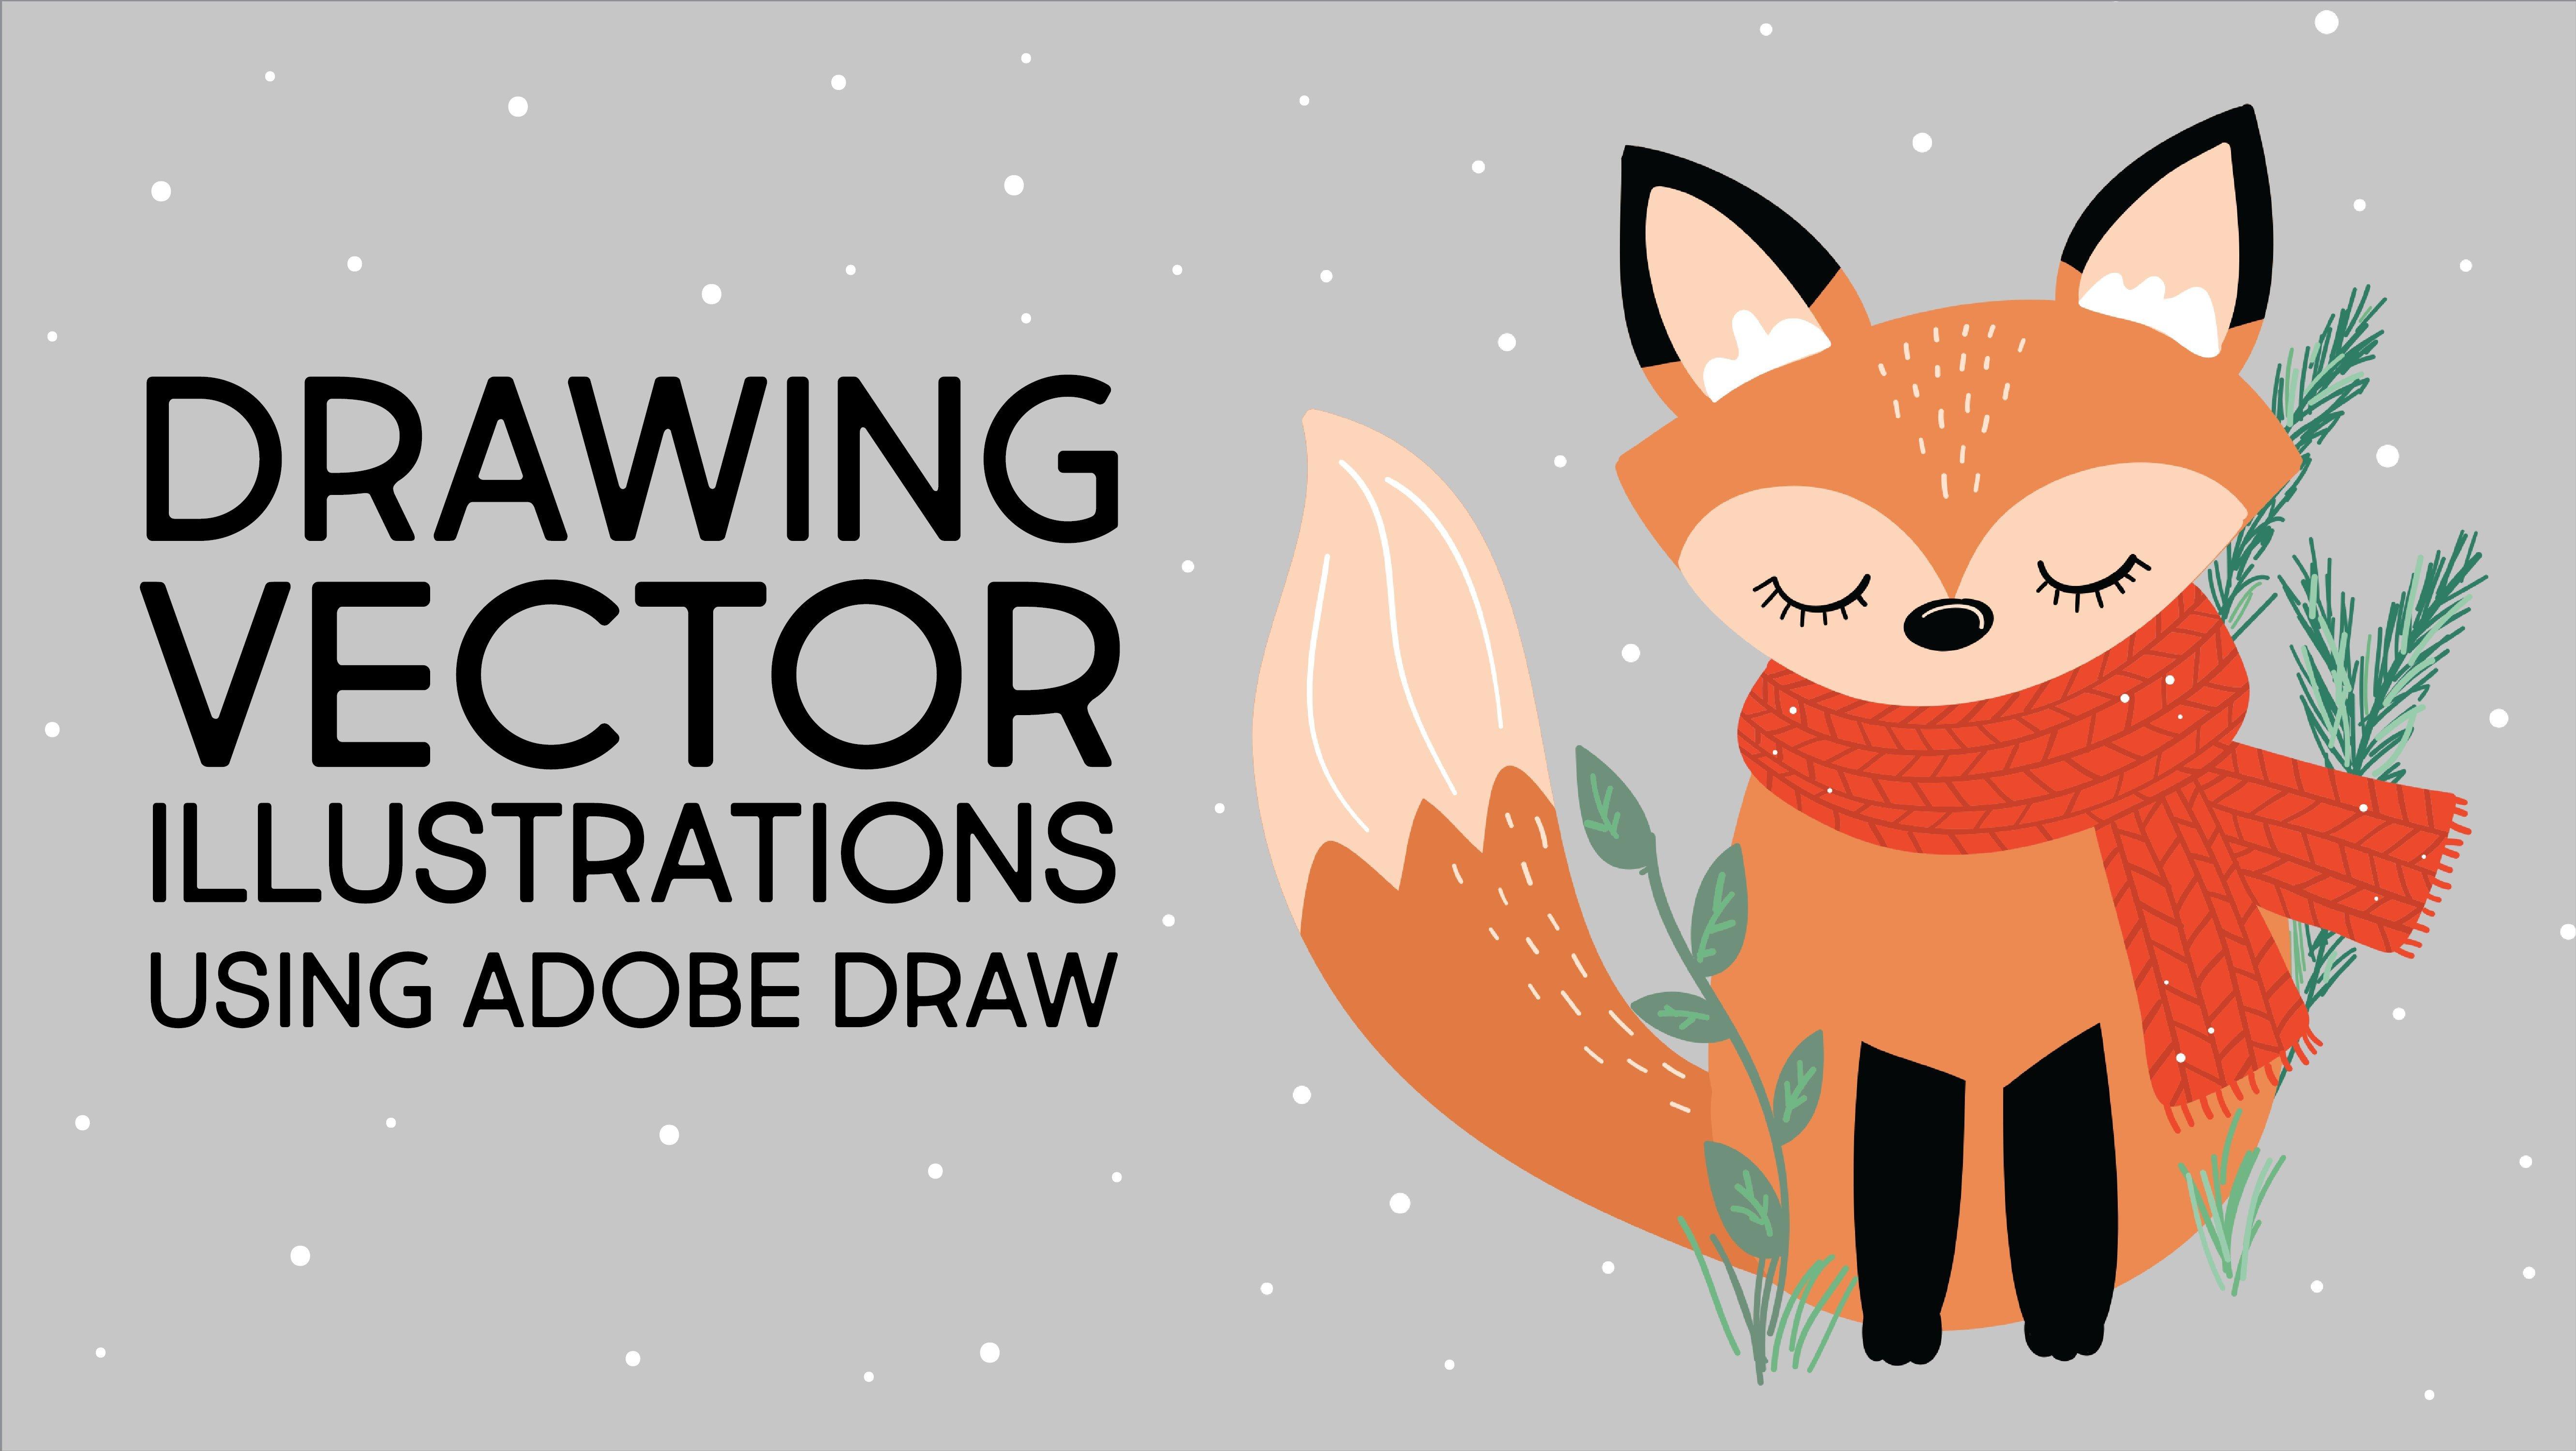 Vector Graphic Illustrations - Drawing on the iPad Pro in Adobe Draw - Digital animal illustrations